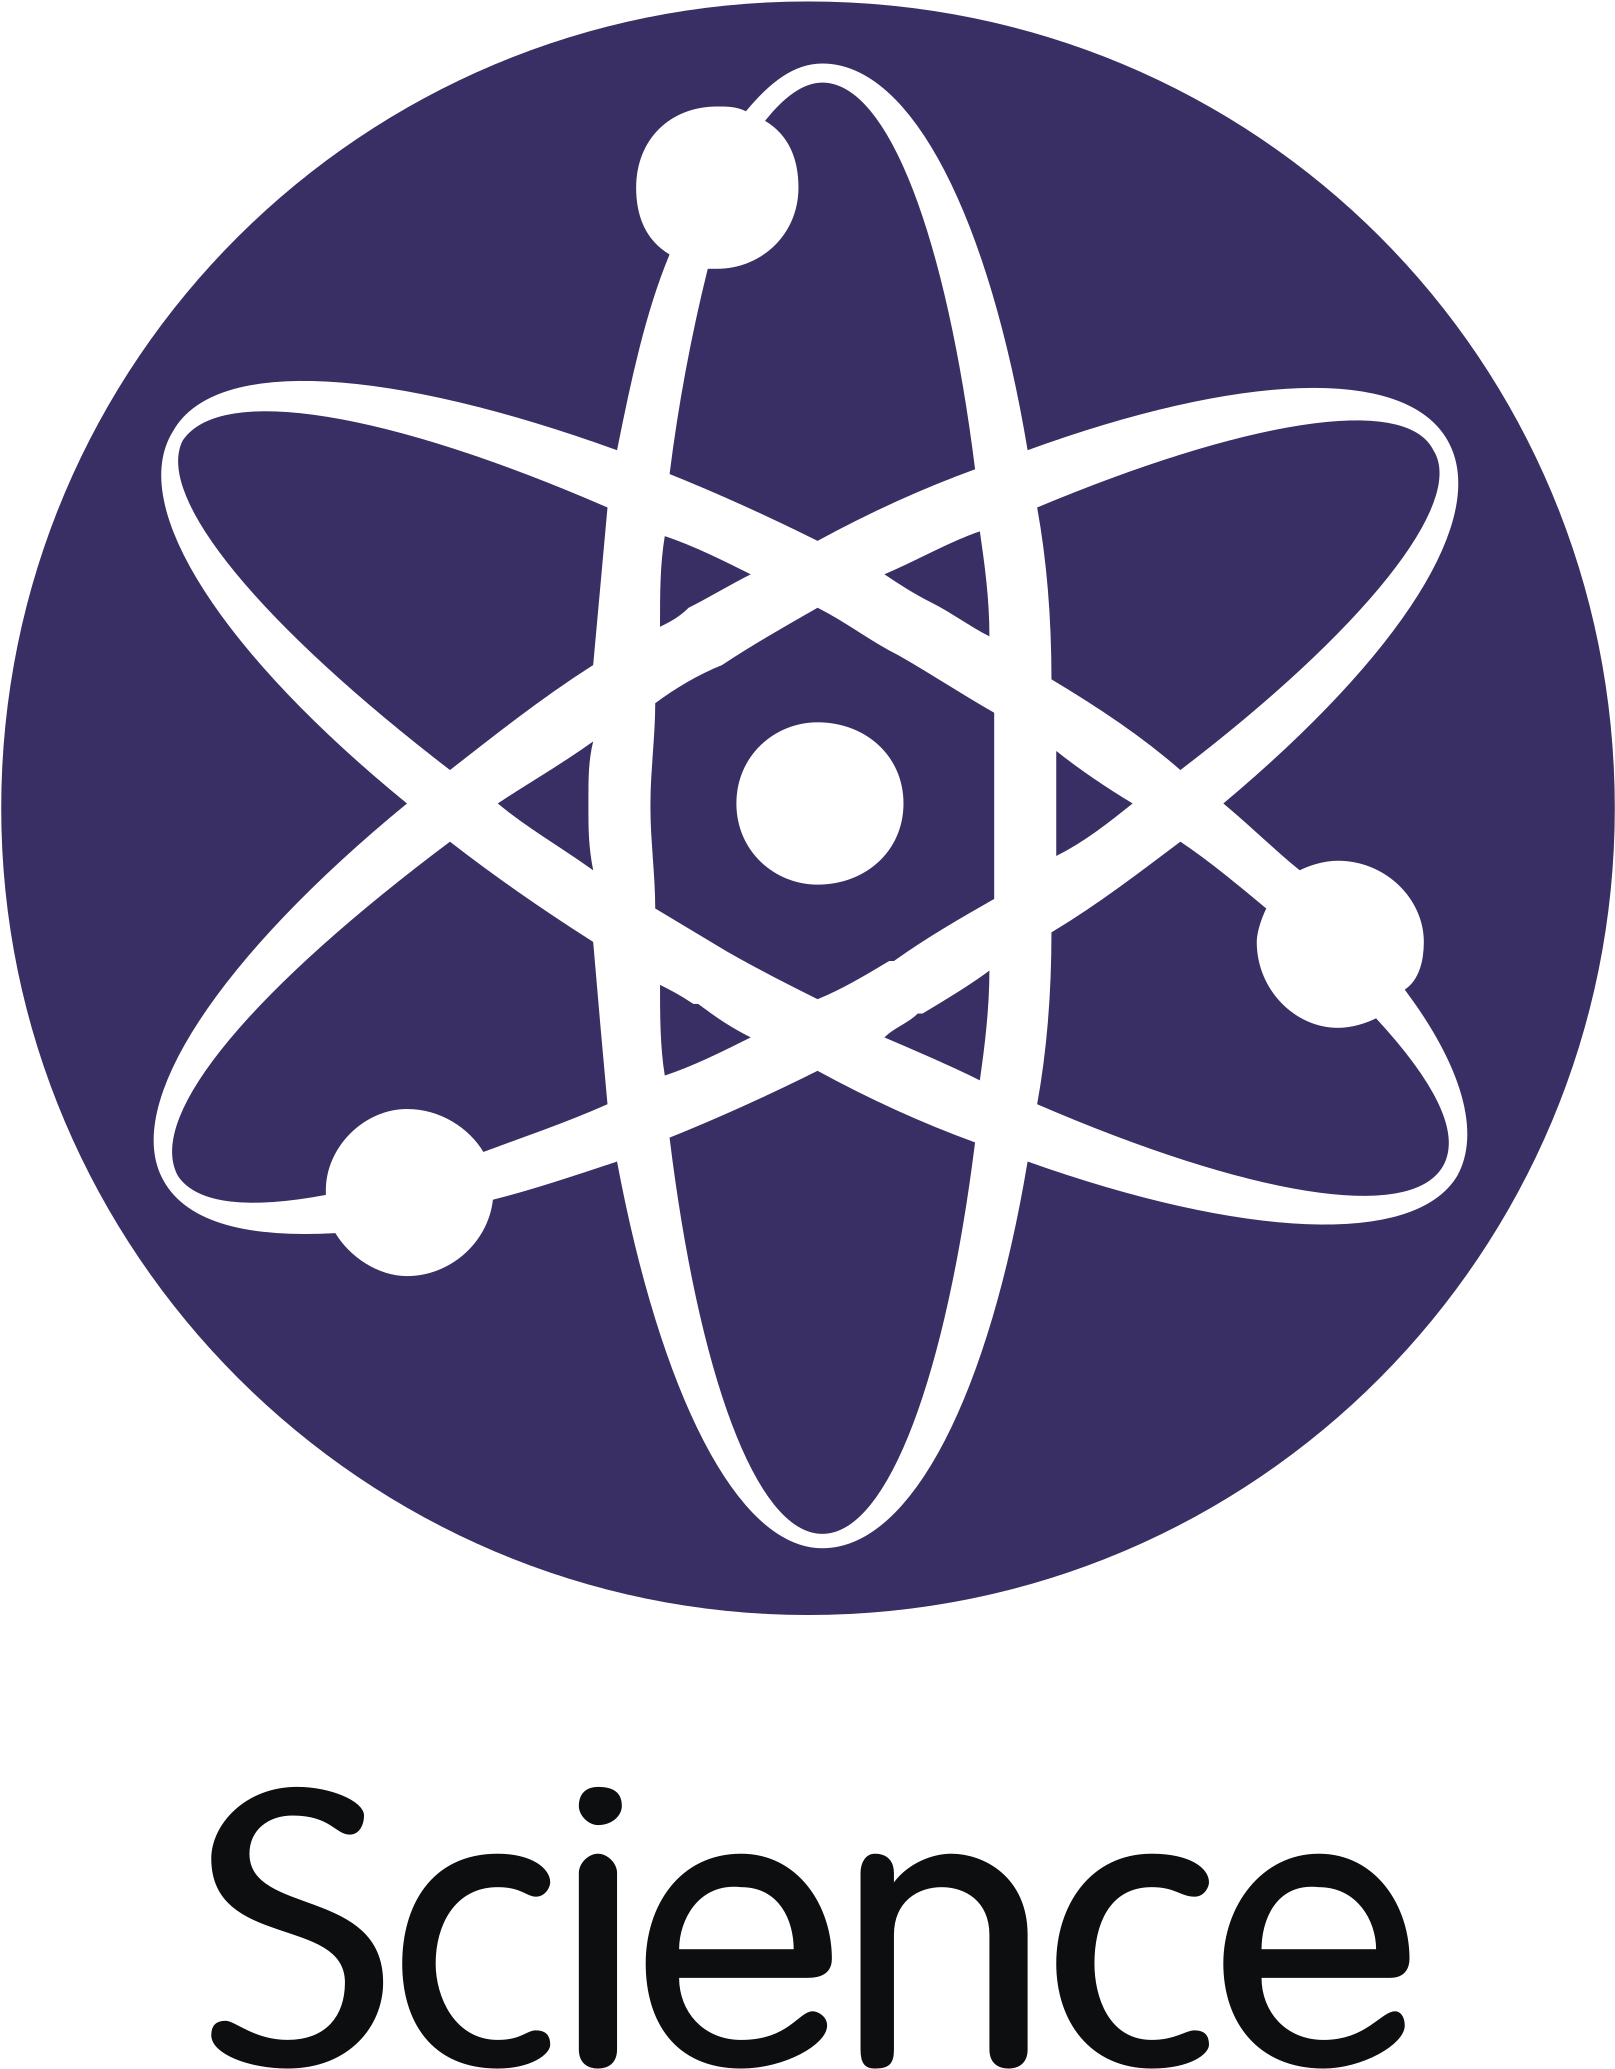 Science Colleges Logo Png Transparent.